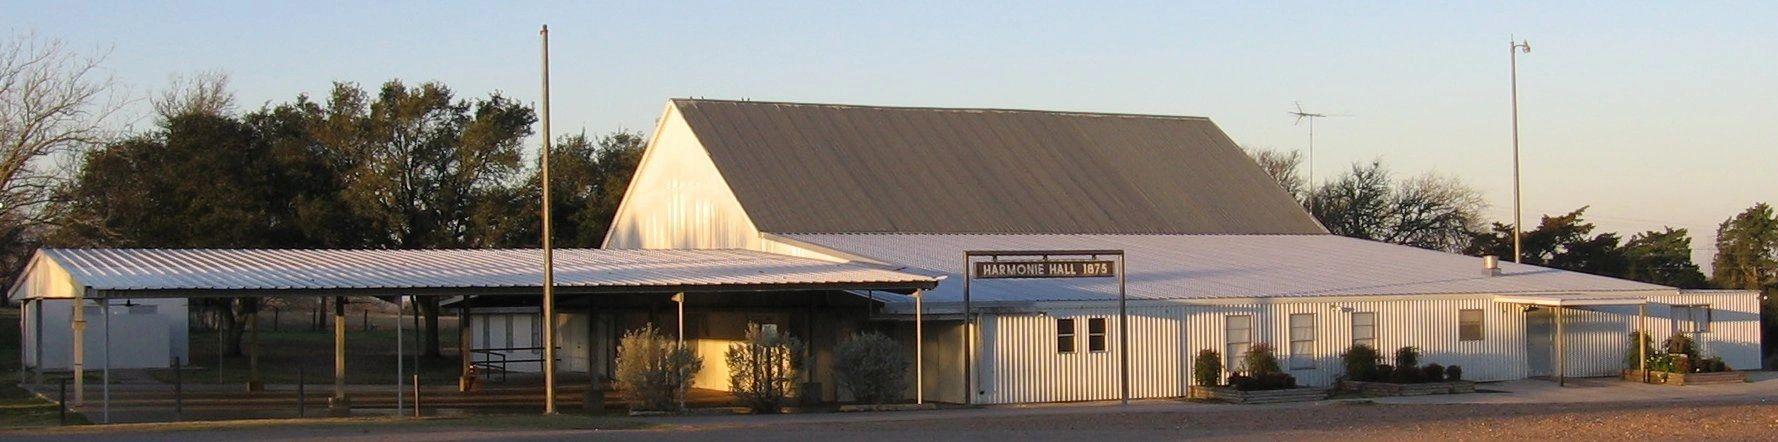 Nearby Lodging | Harmonie Hall, Shelby, Texas